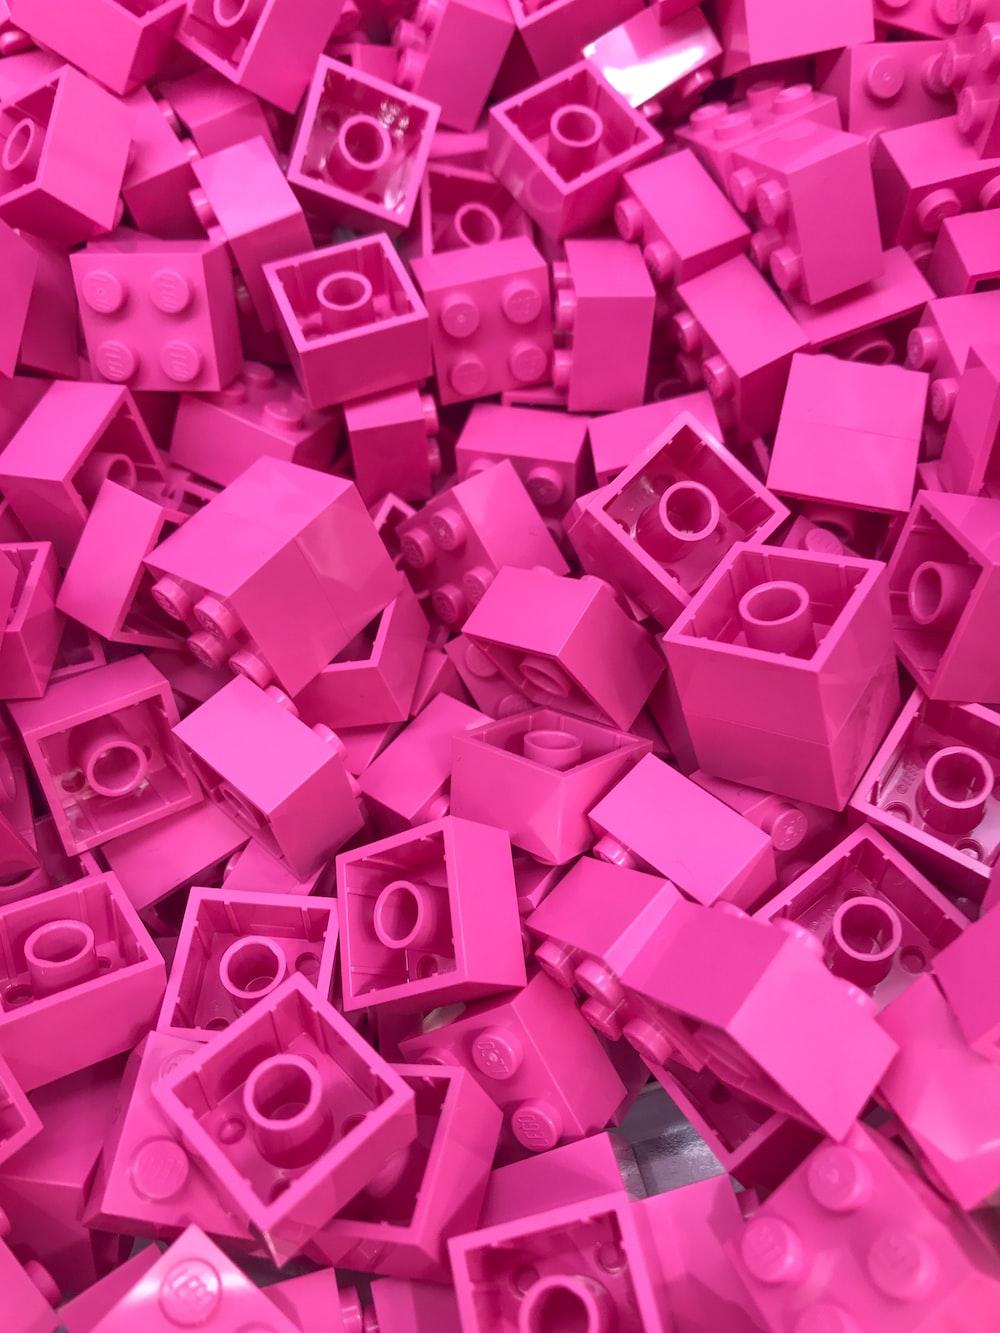 pink plastic building blocks toy